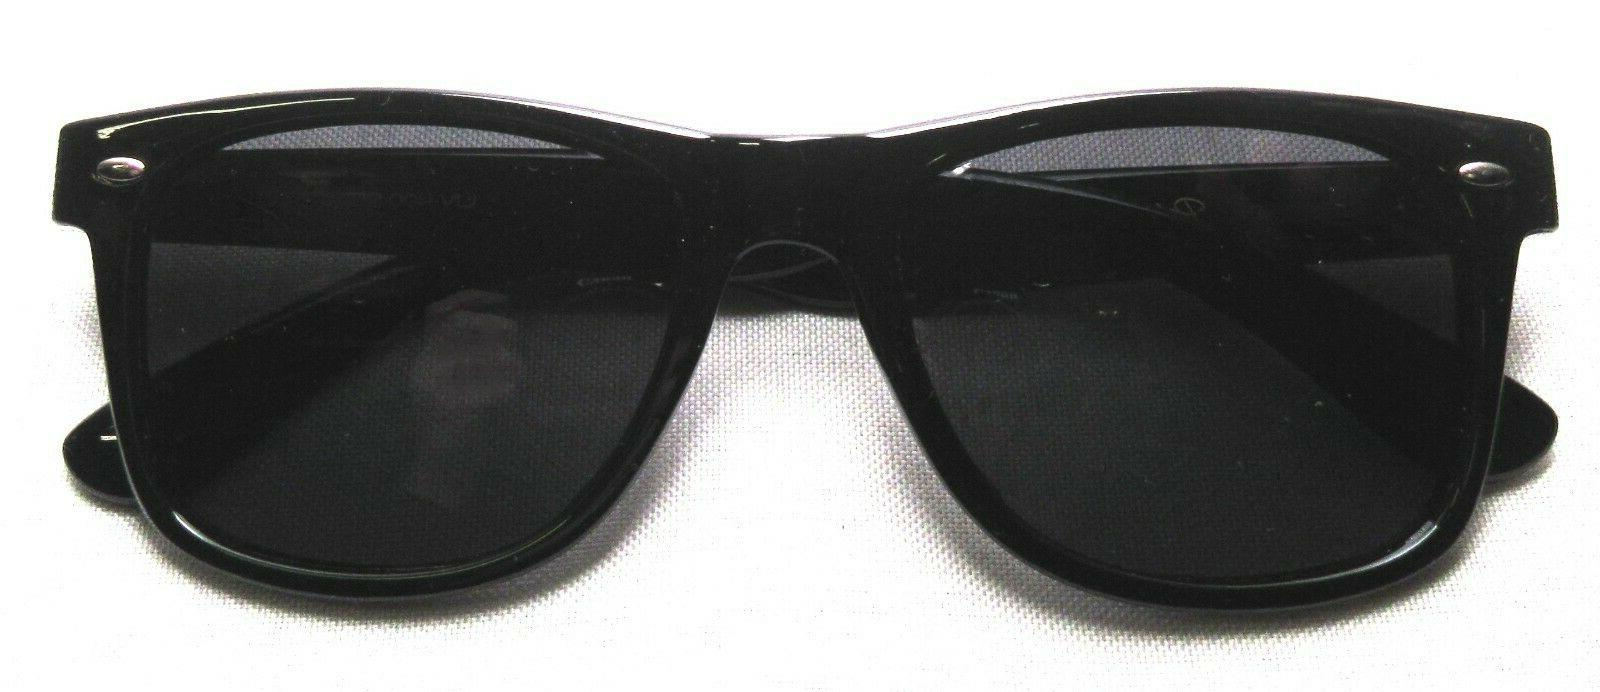 POLARSPEX Polarized 80's Retro Sunglasses UV 400 PSX01-BK-SMK